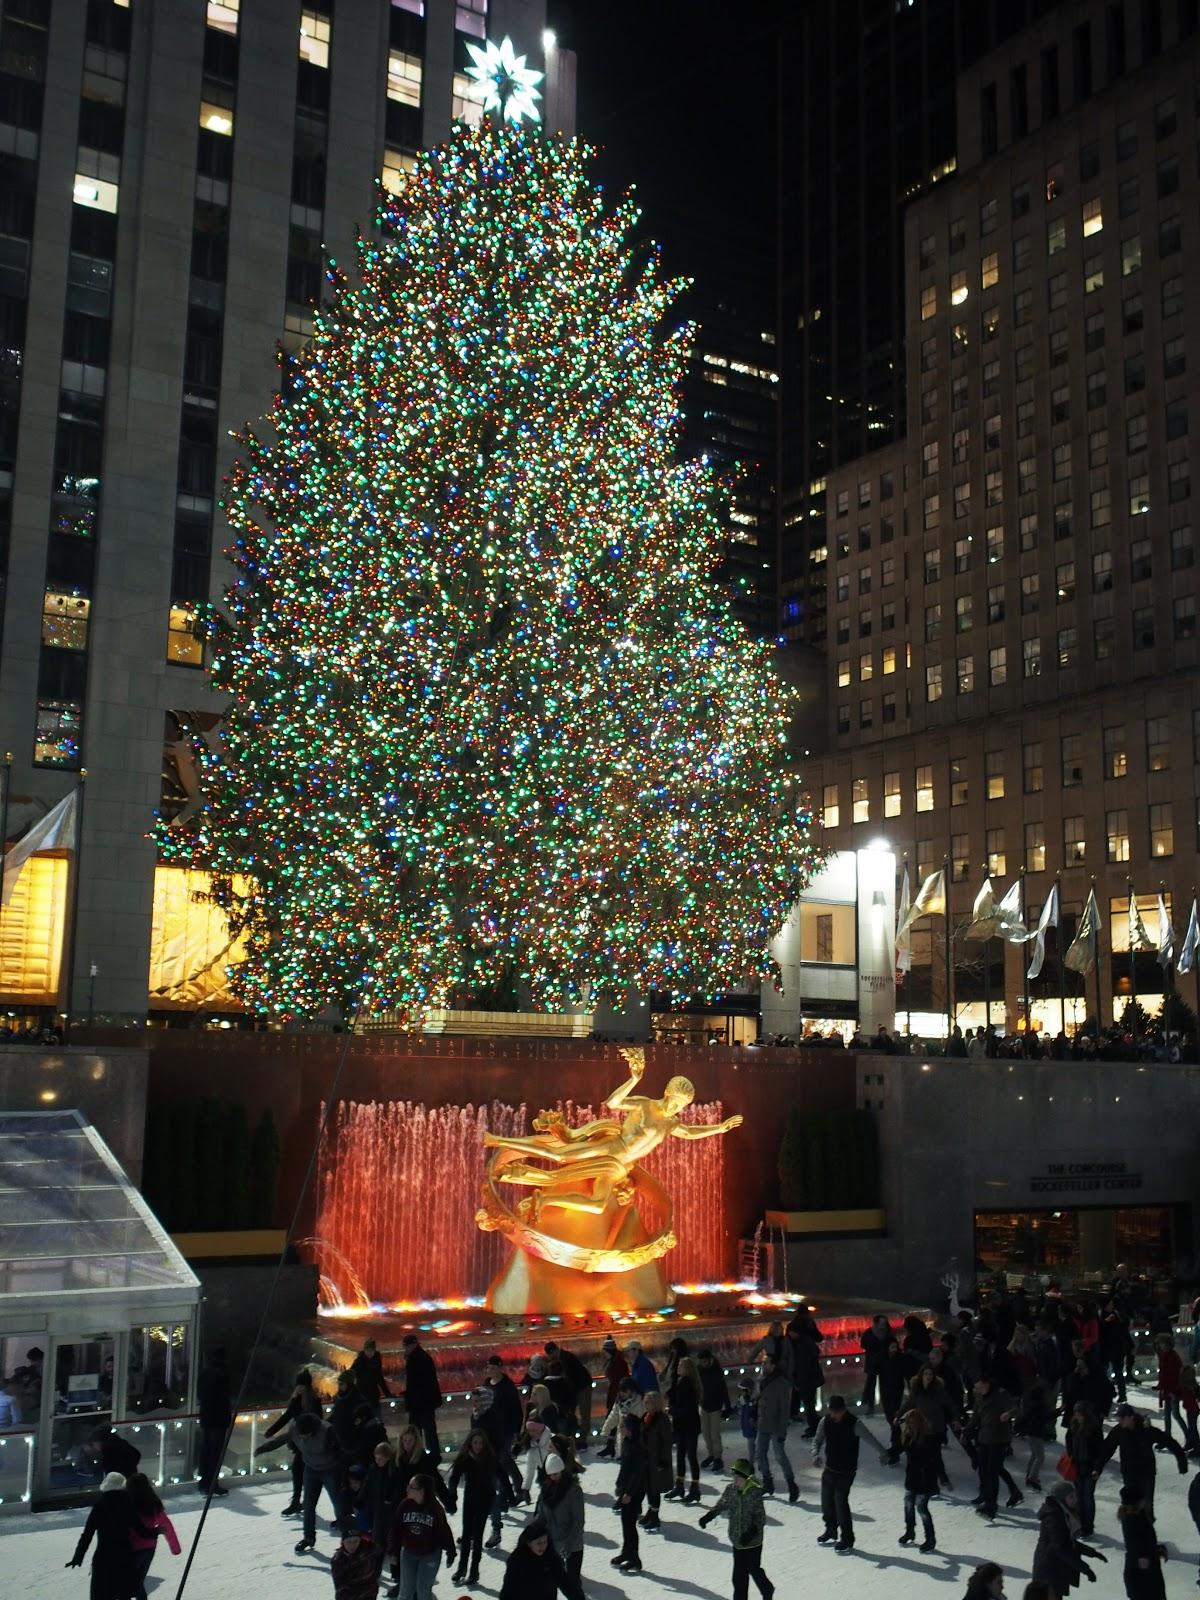 #RockCenter Tree - 2014 #RockCenterTree2014  #holidays #holidaysinNYC #rockefellercenter #NYC ©2014 Nancy Lundebjerg